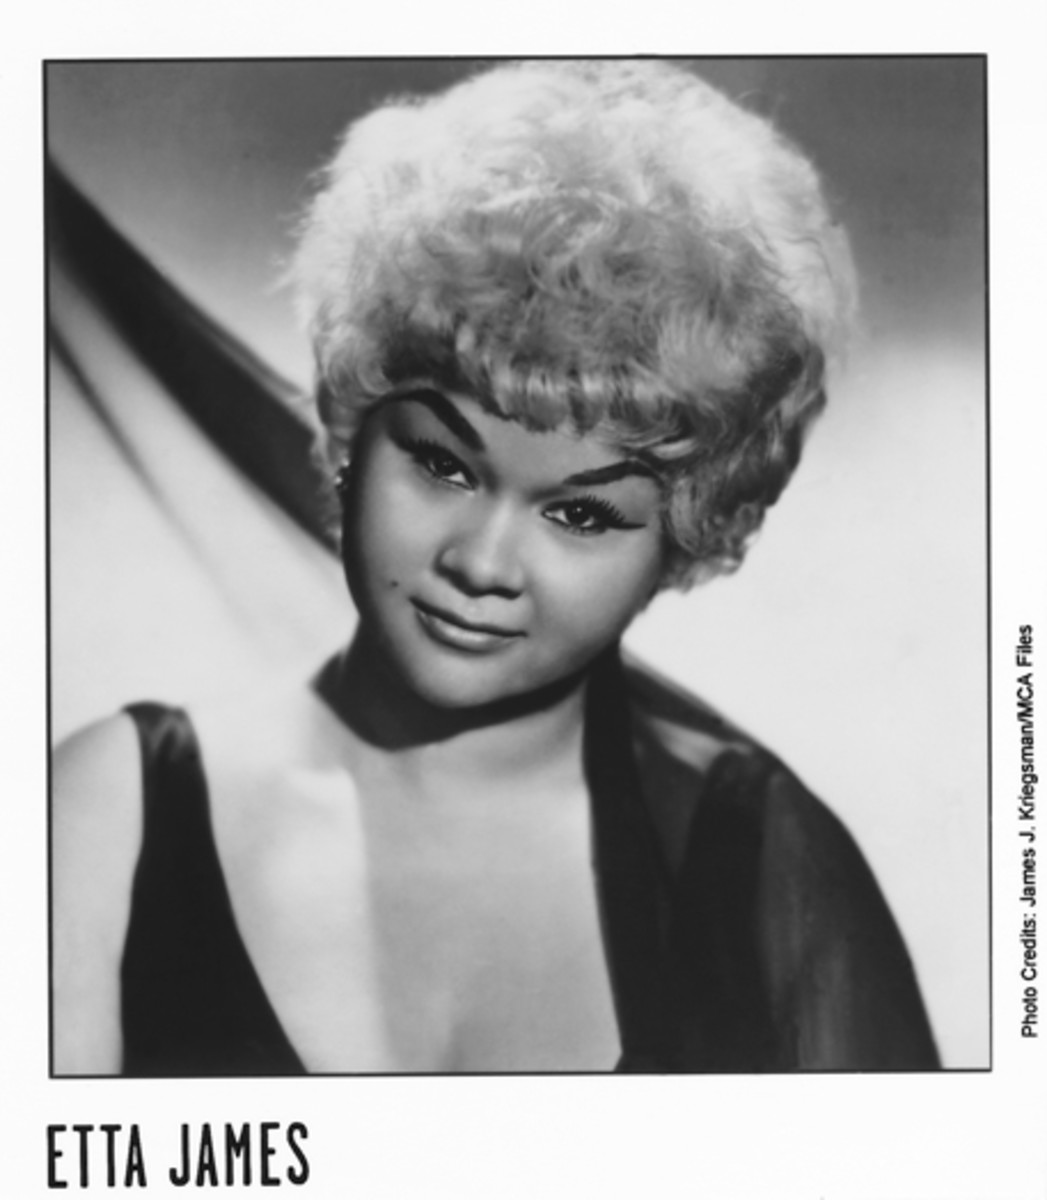 Etta James. Publicity photo courtesy MCA/James J. Kriegsman.